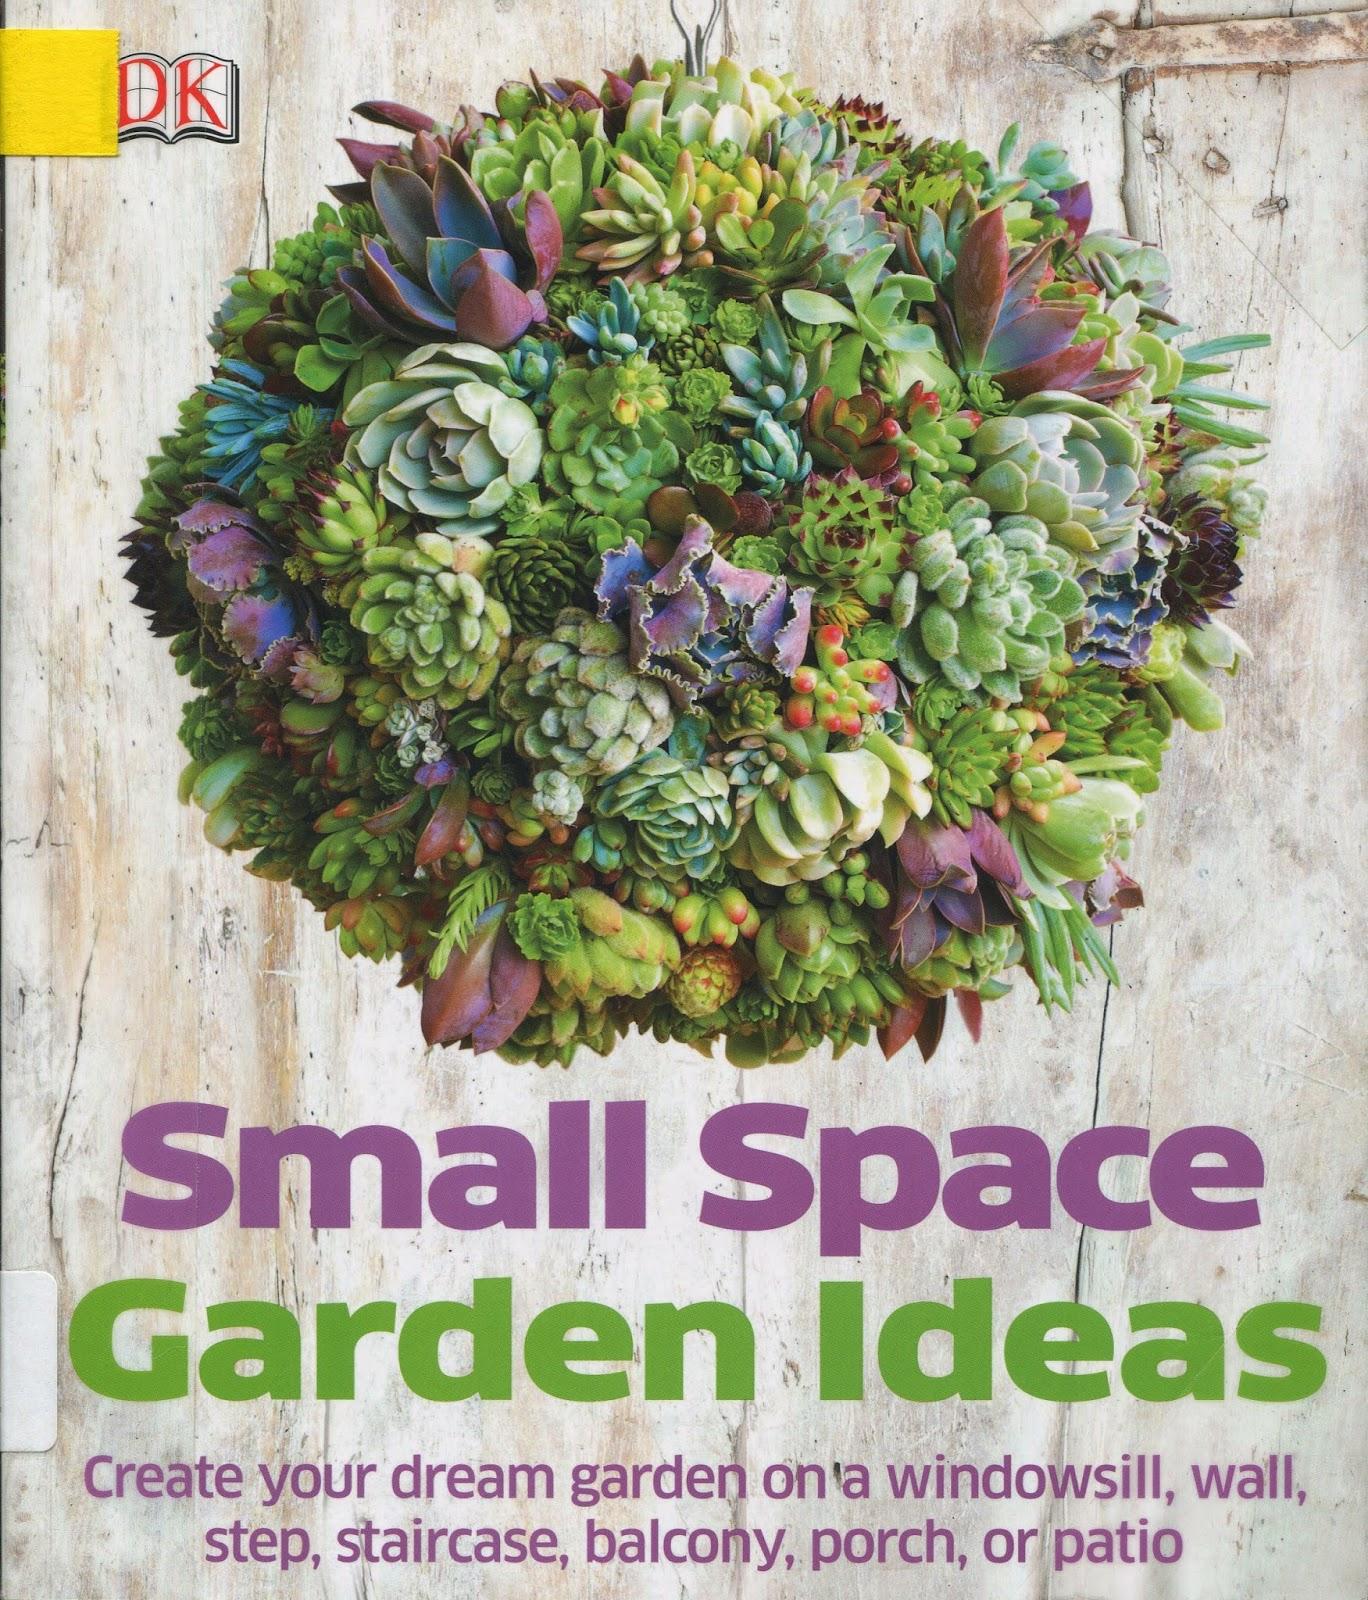 Backyard Patch Herbal Blog: Book Review - Small Space Garden Ideas